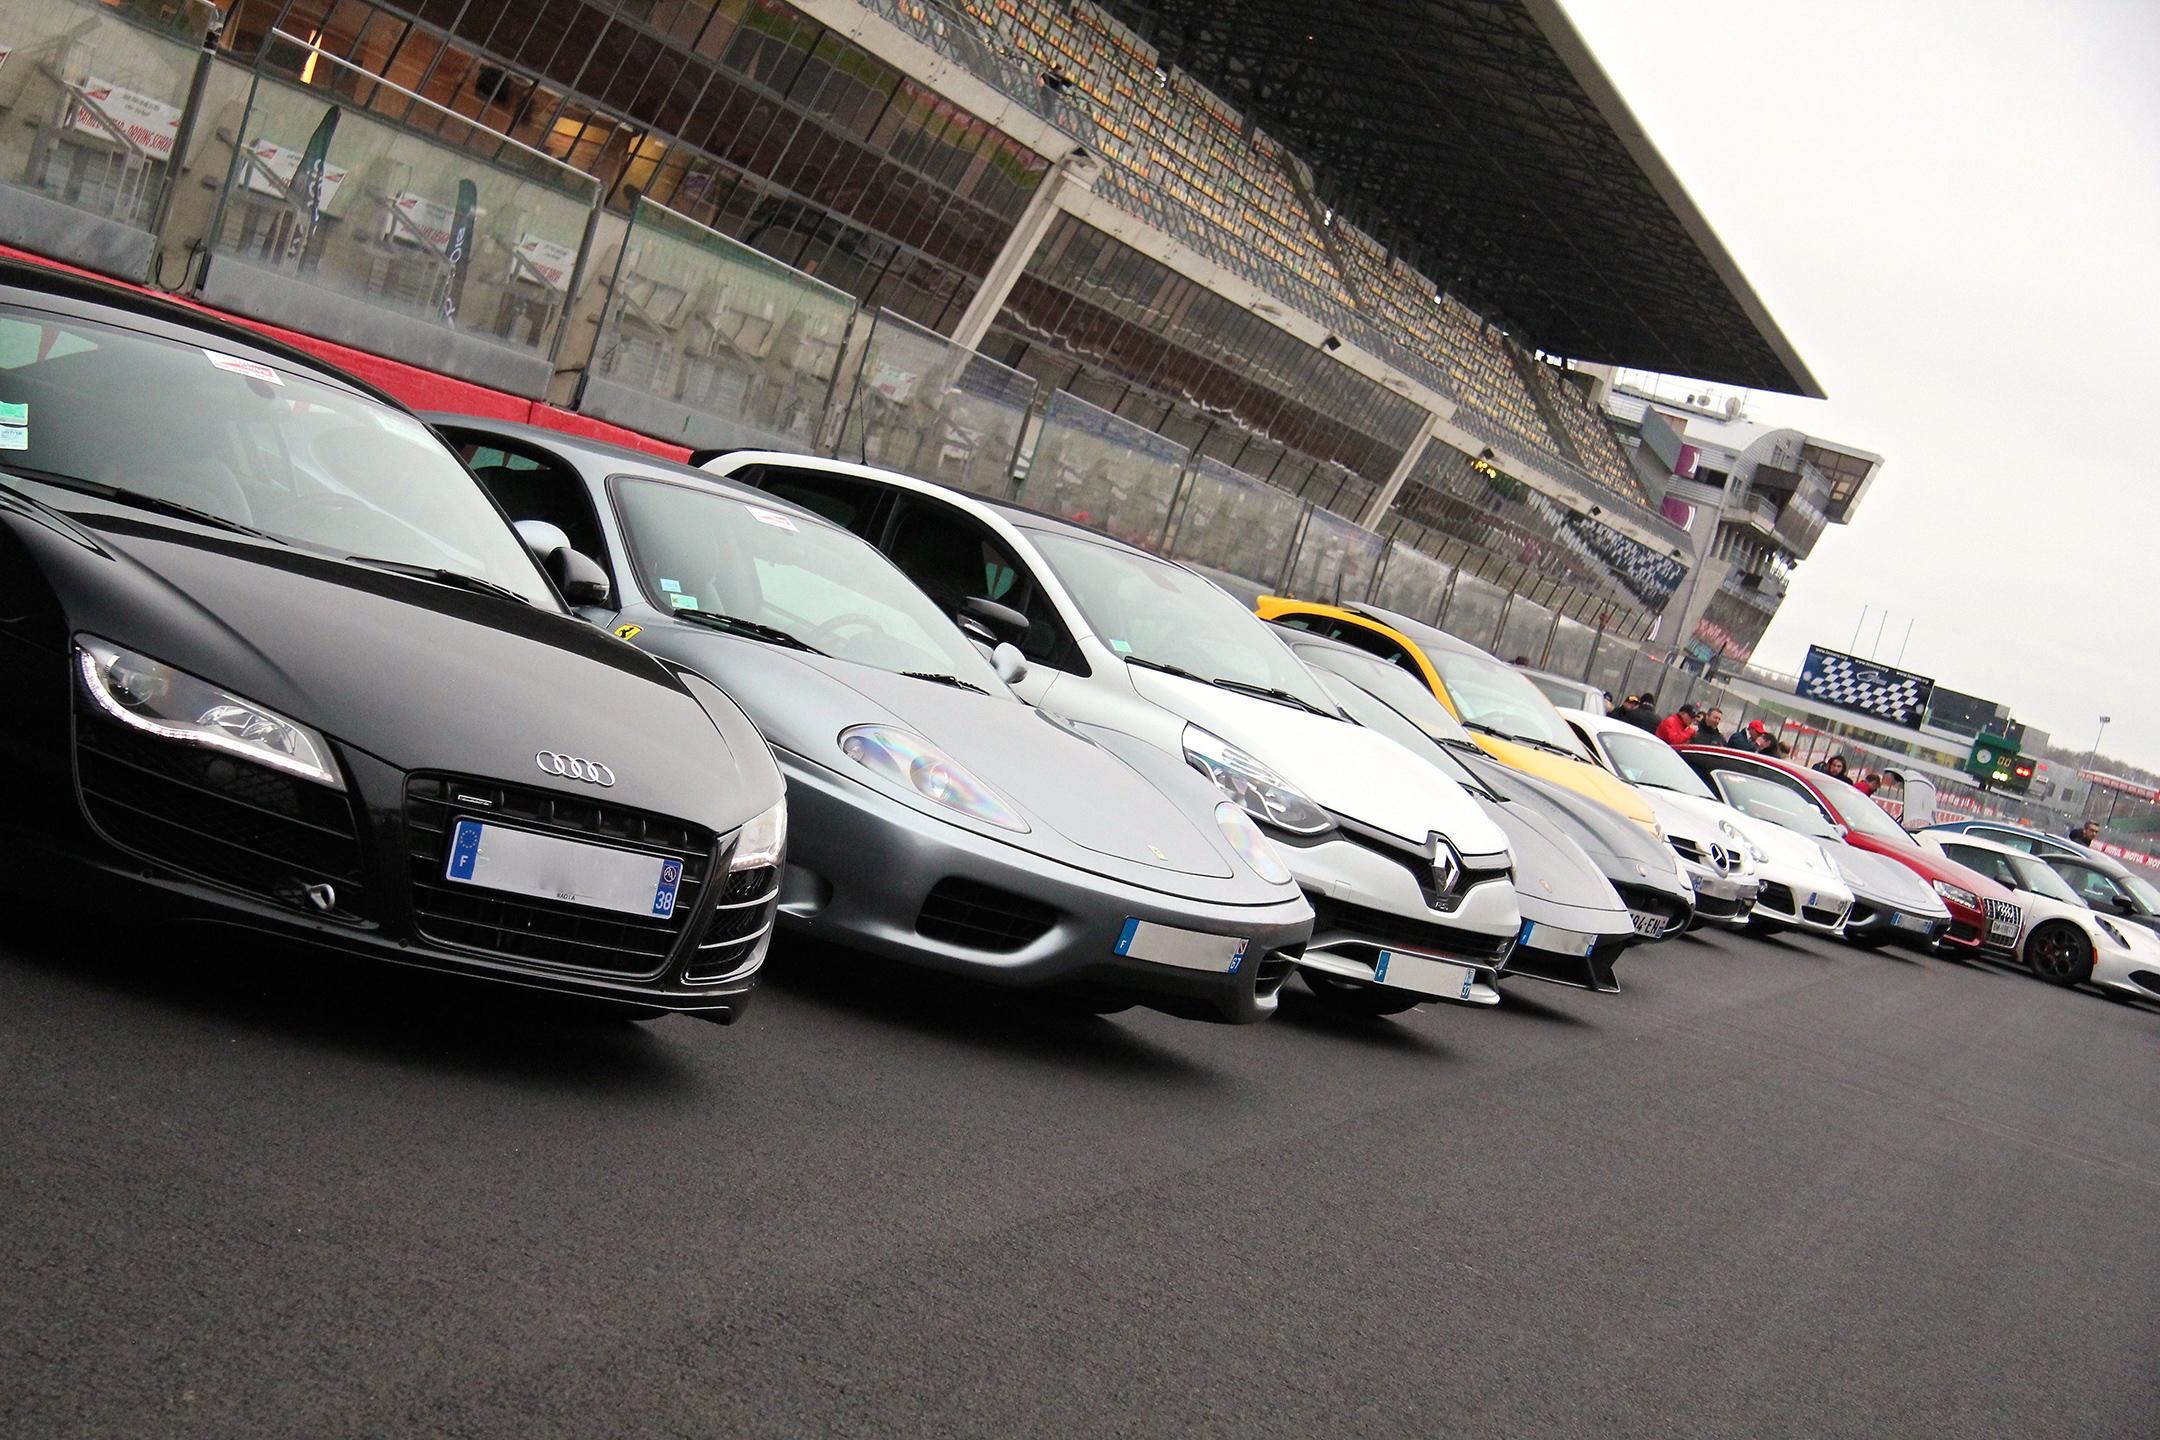 front-hood grid start - Car and-coffee - club EAP - Exclusive Drive 2017 - photo Ludo FerrariPhoto-Ludo-Ferrari